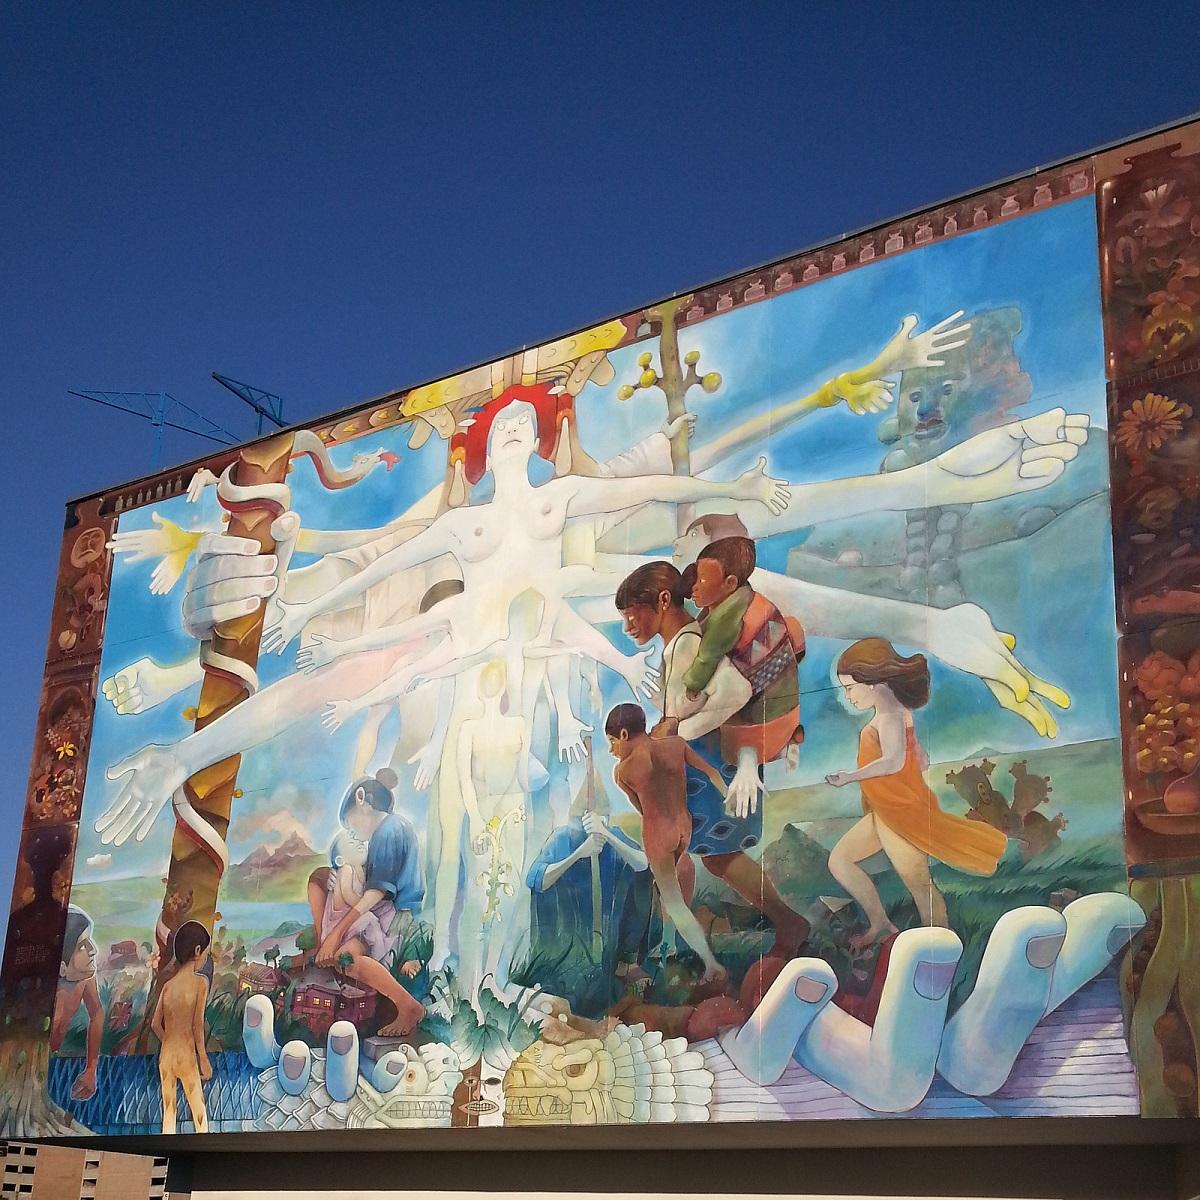 dhear-one-similia-similibus-curentur-new-mural-06